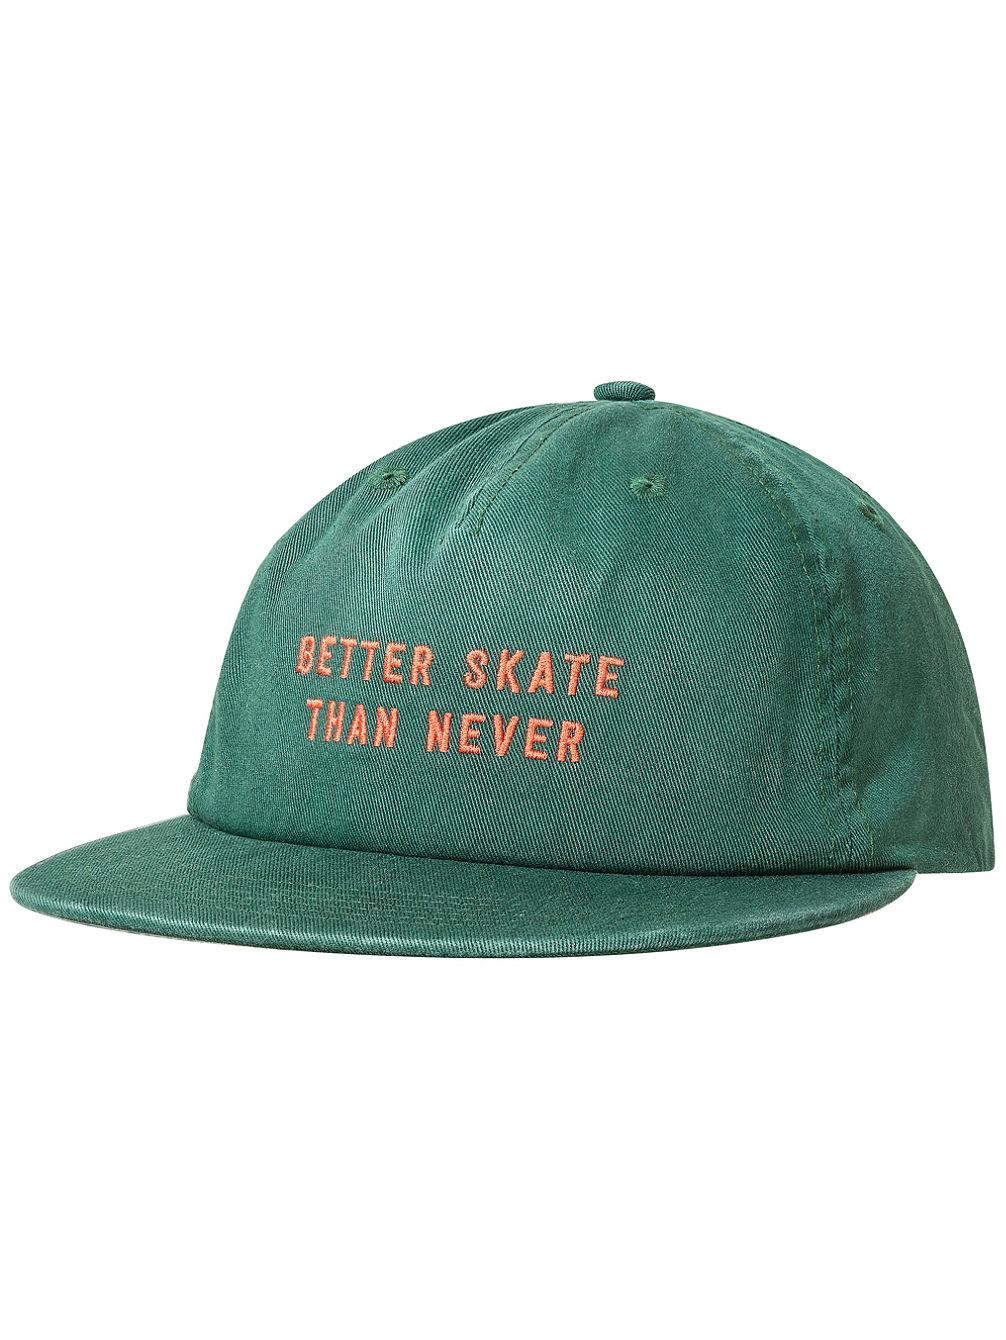 Compra Globe Better Skate Low Rise Gorra en línea en blue-tomato.com 2f000170b76